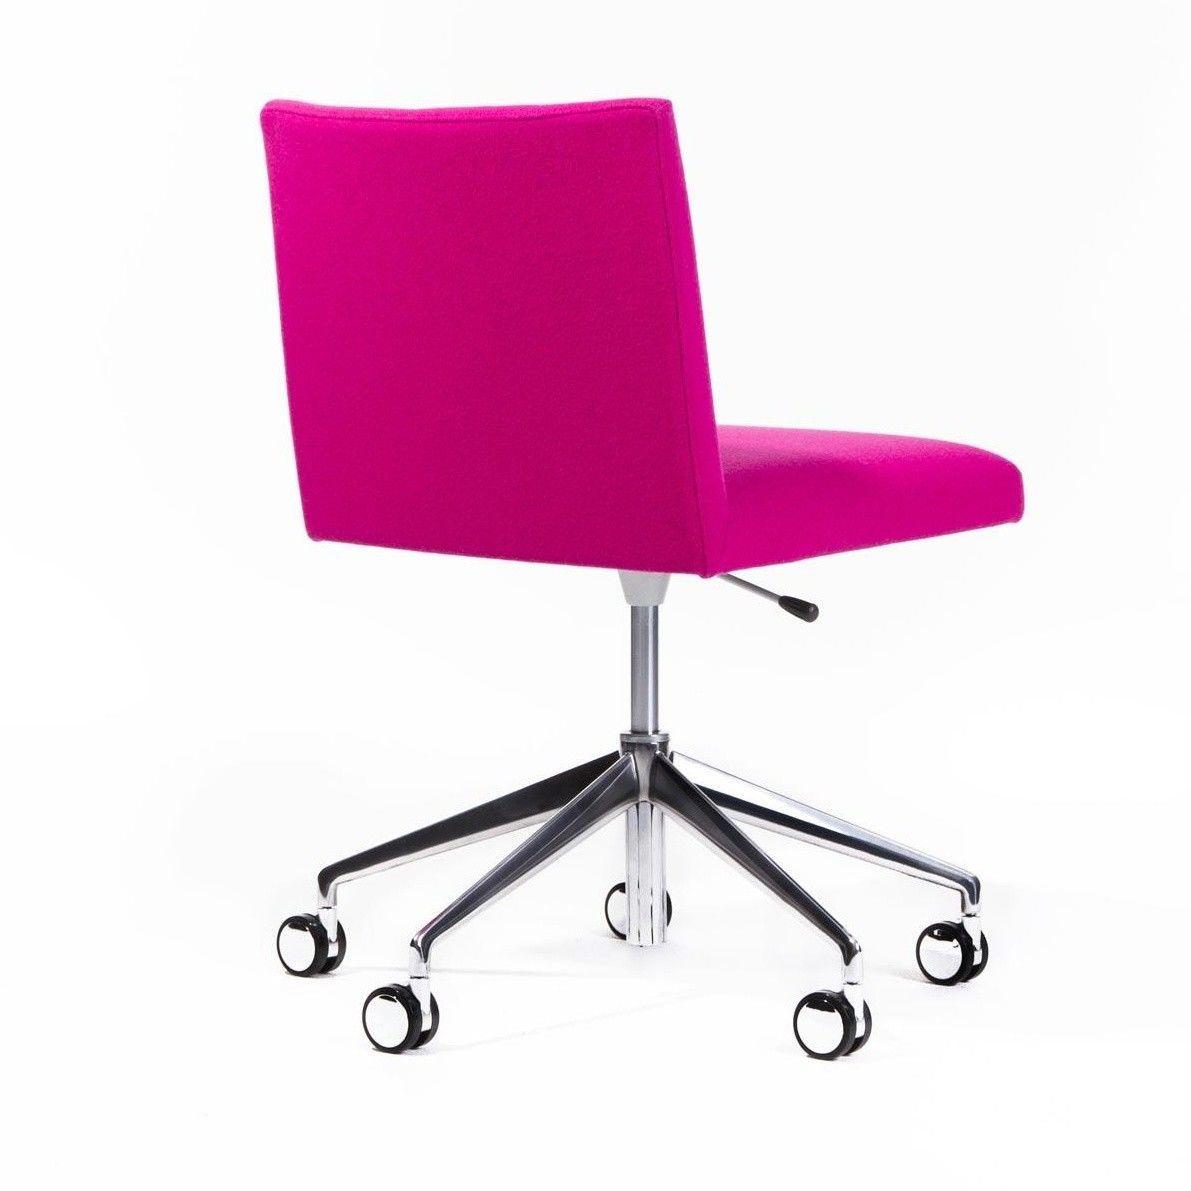 Masai chaise pivotante sur roulettes arper lievore for Chaise pivotante